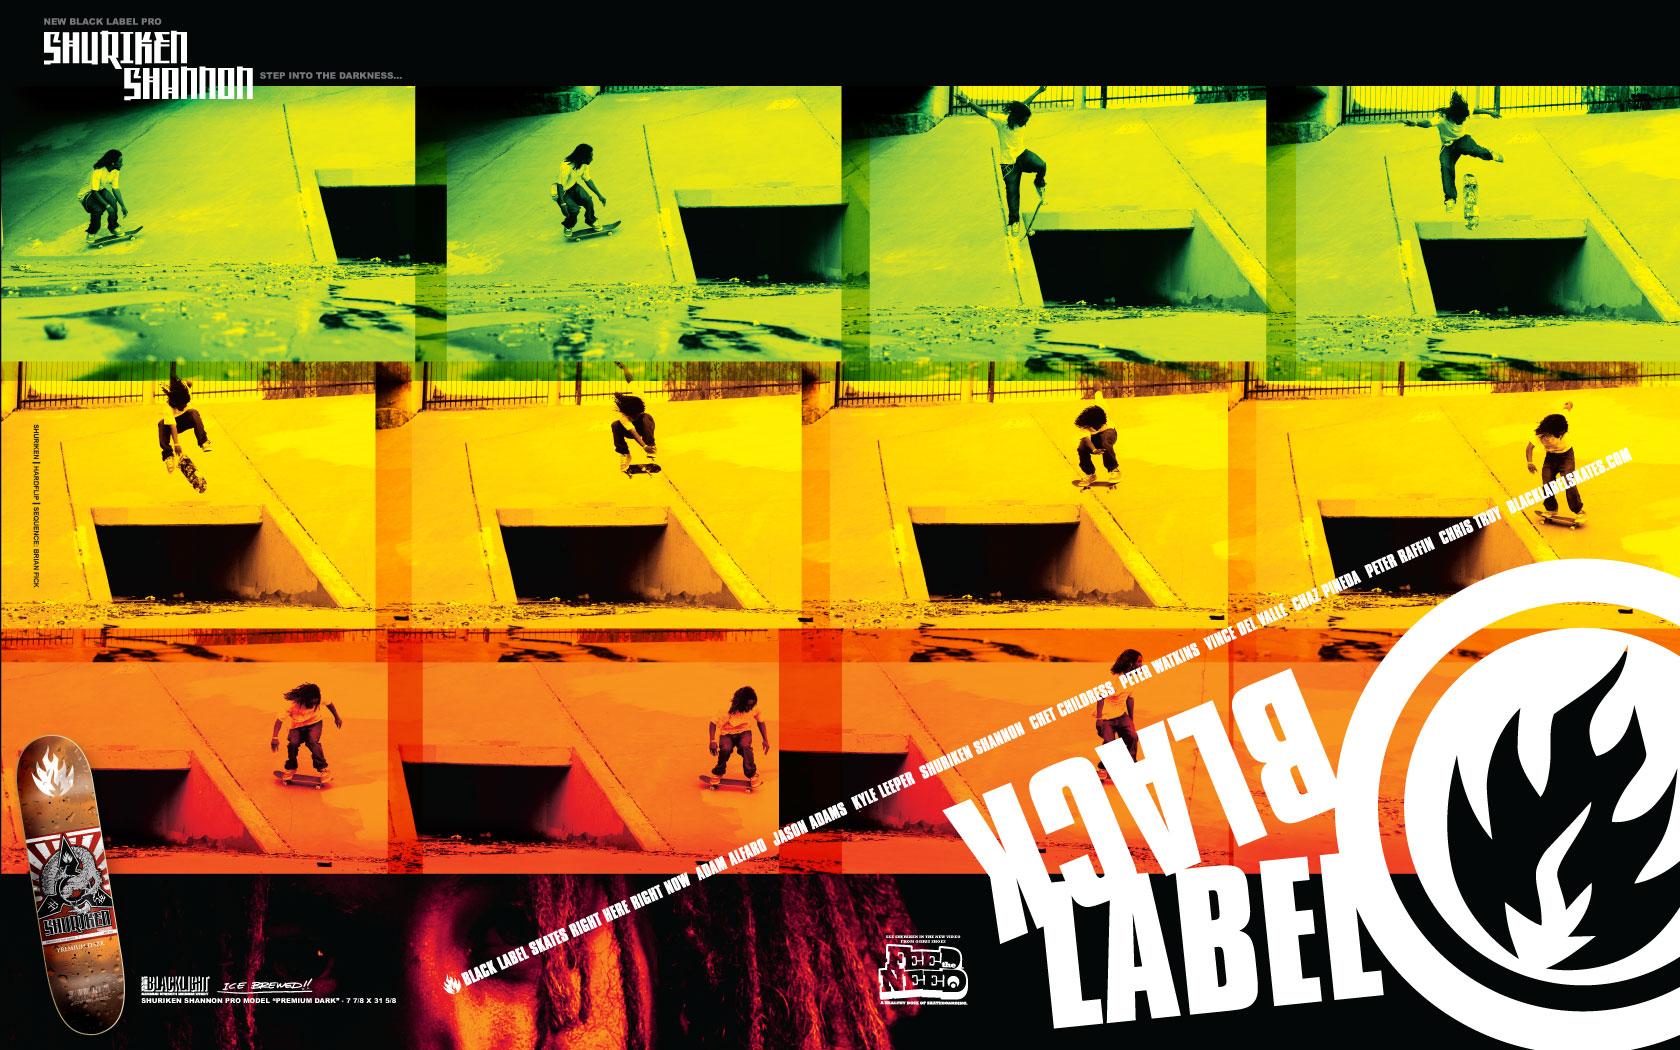 Skate Logo Wallpaper Skateboards Pictures 1680x1050